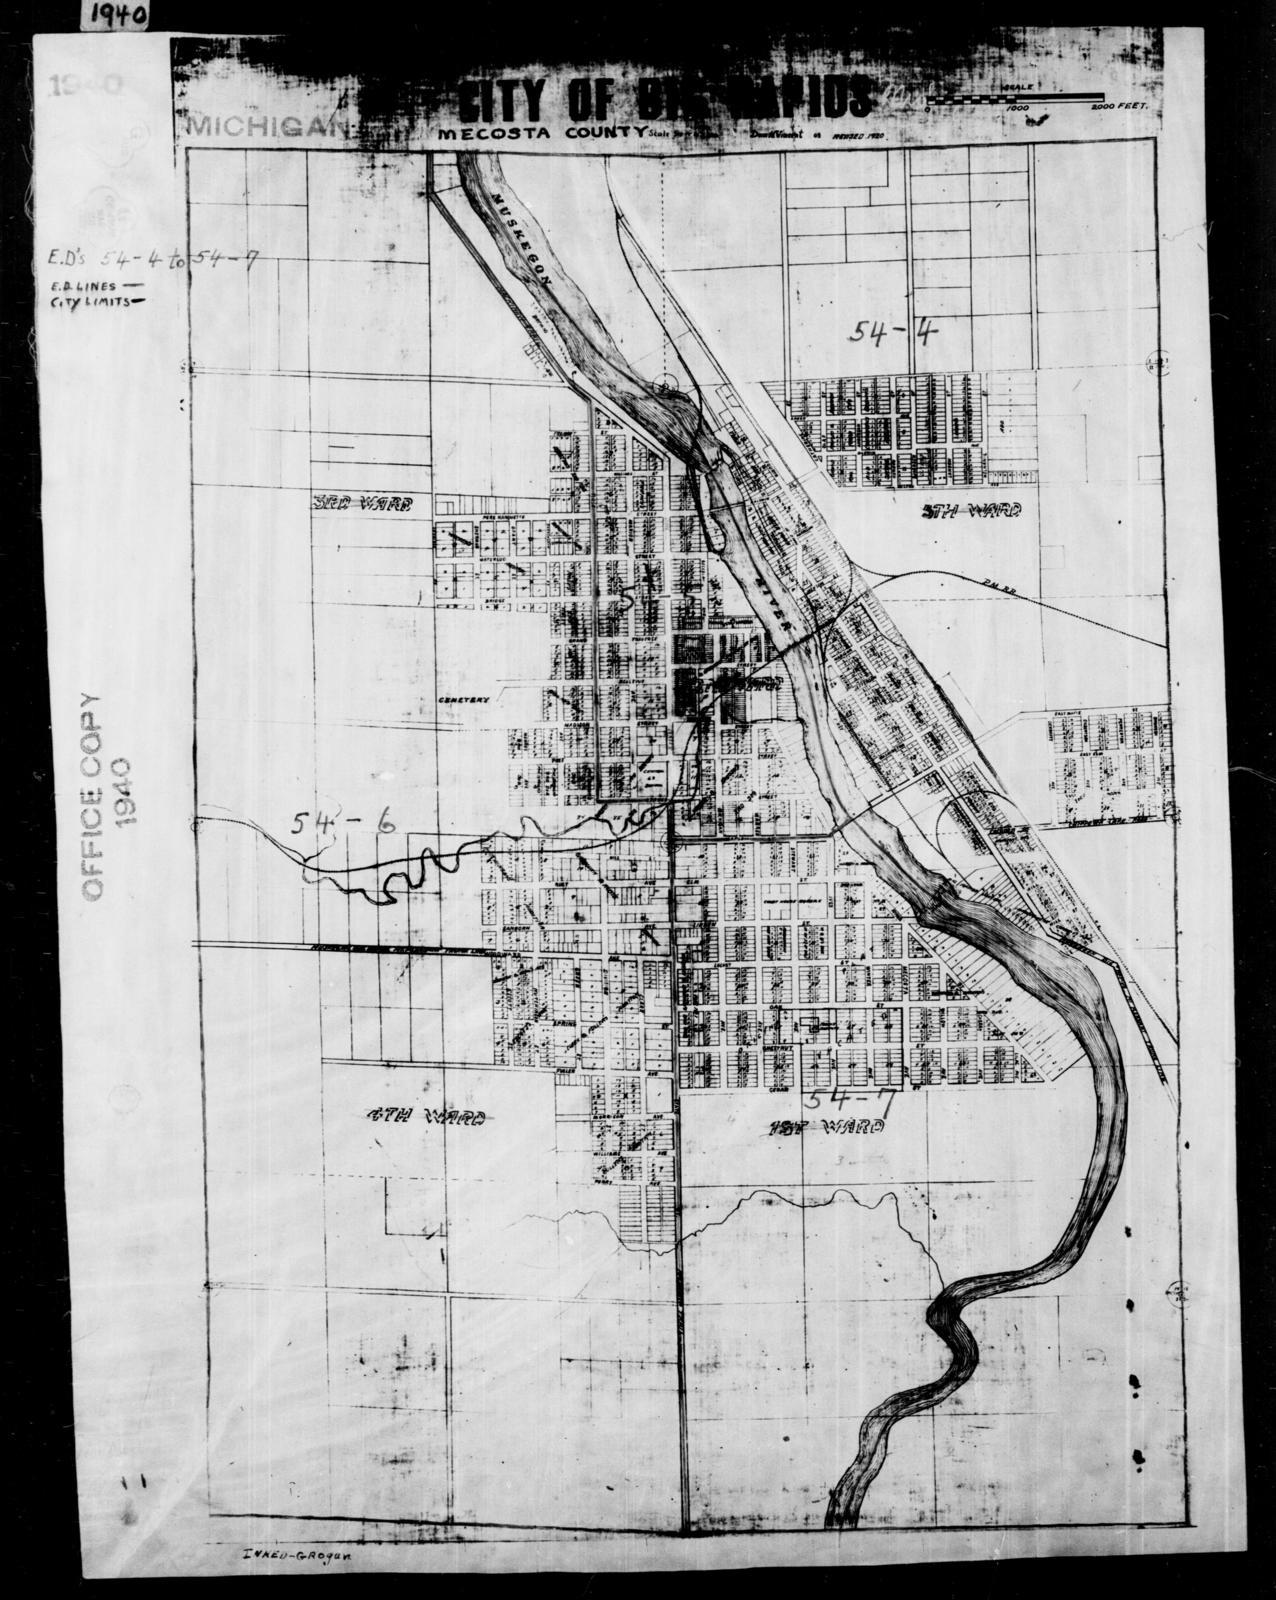 Mecosta Michigan Map.1940 Census Enumeration District Maps Michigan Mecosta County